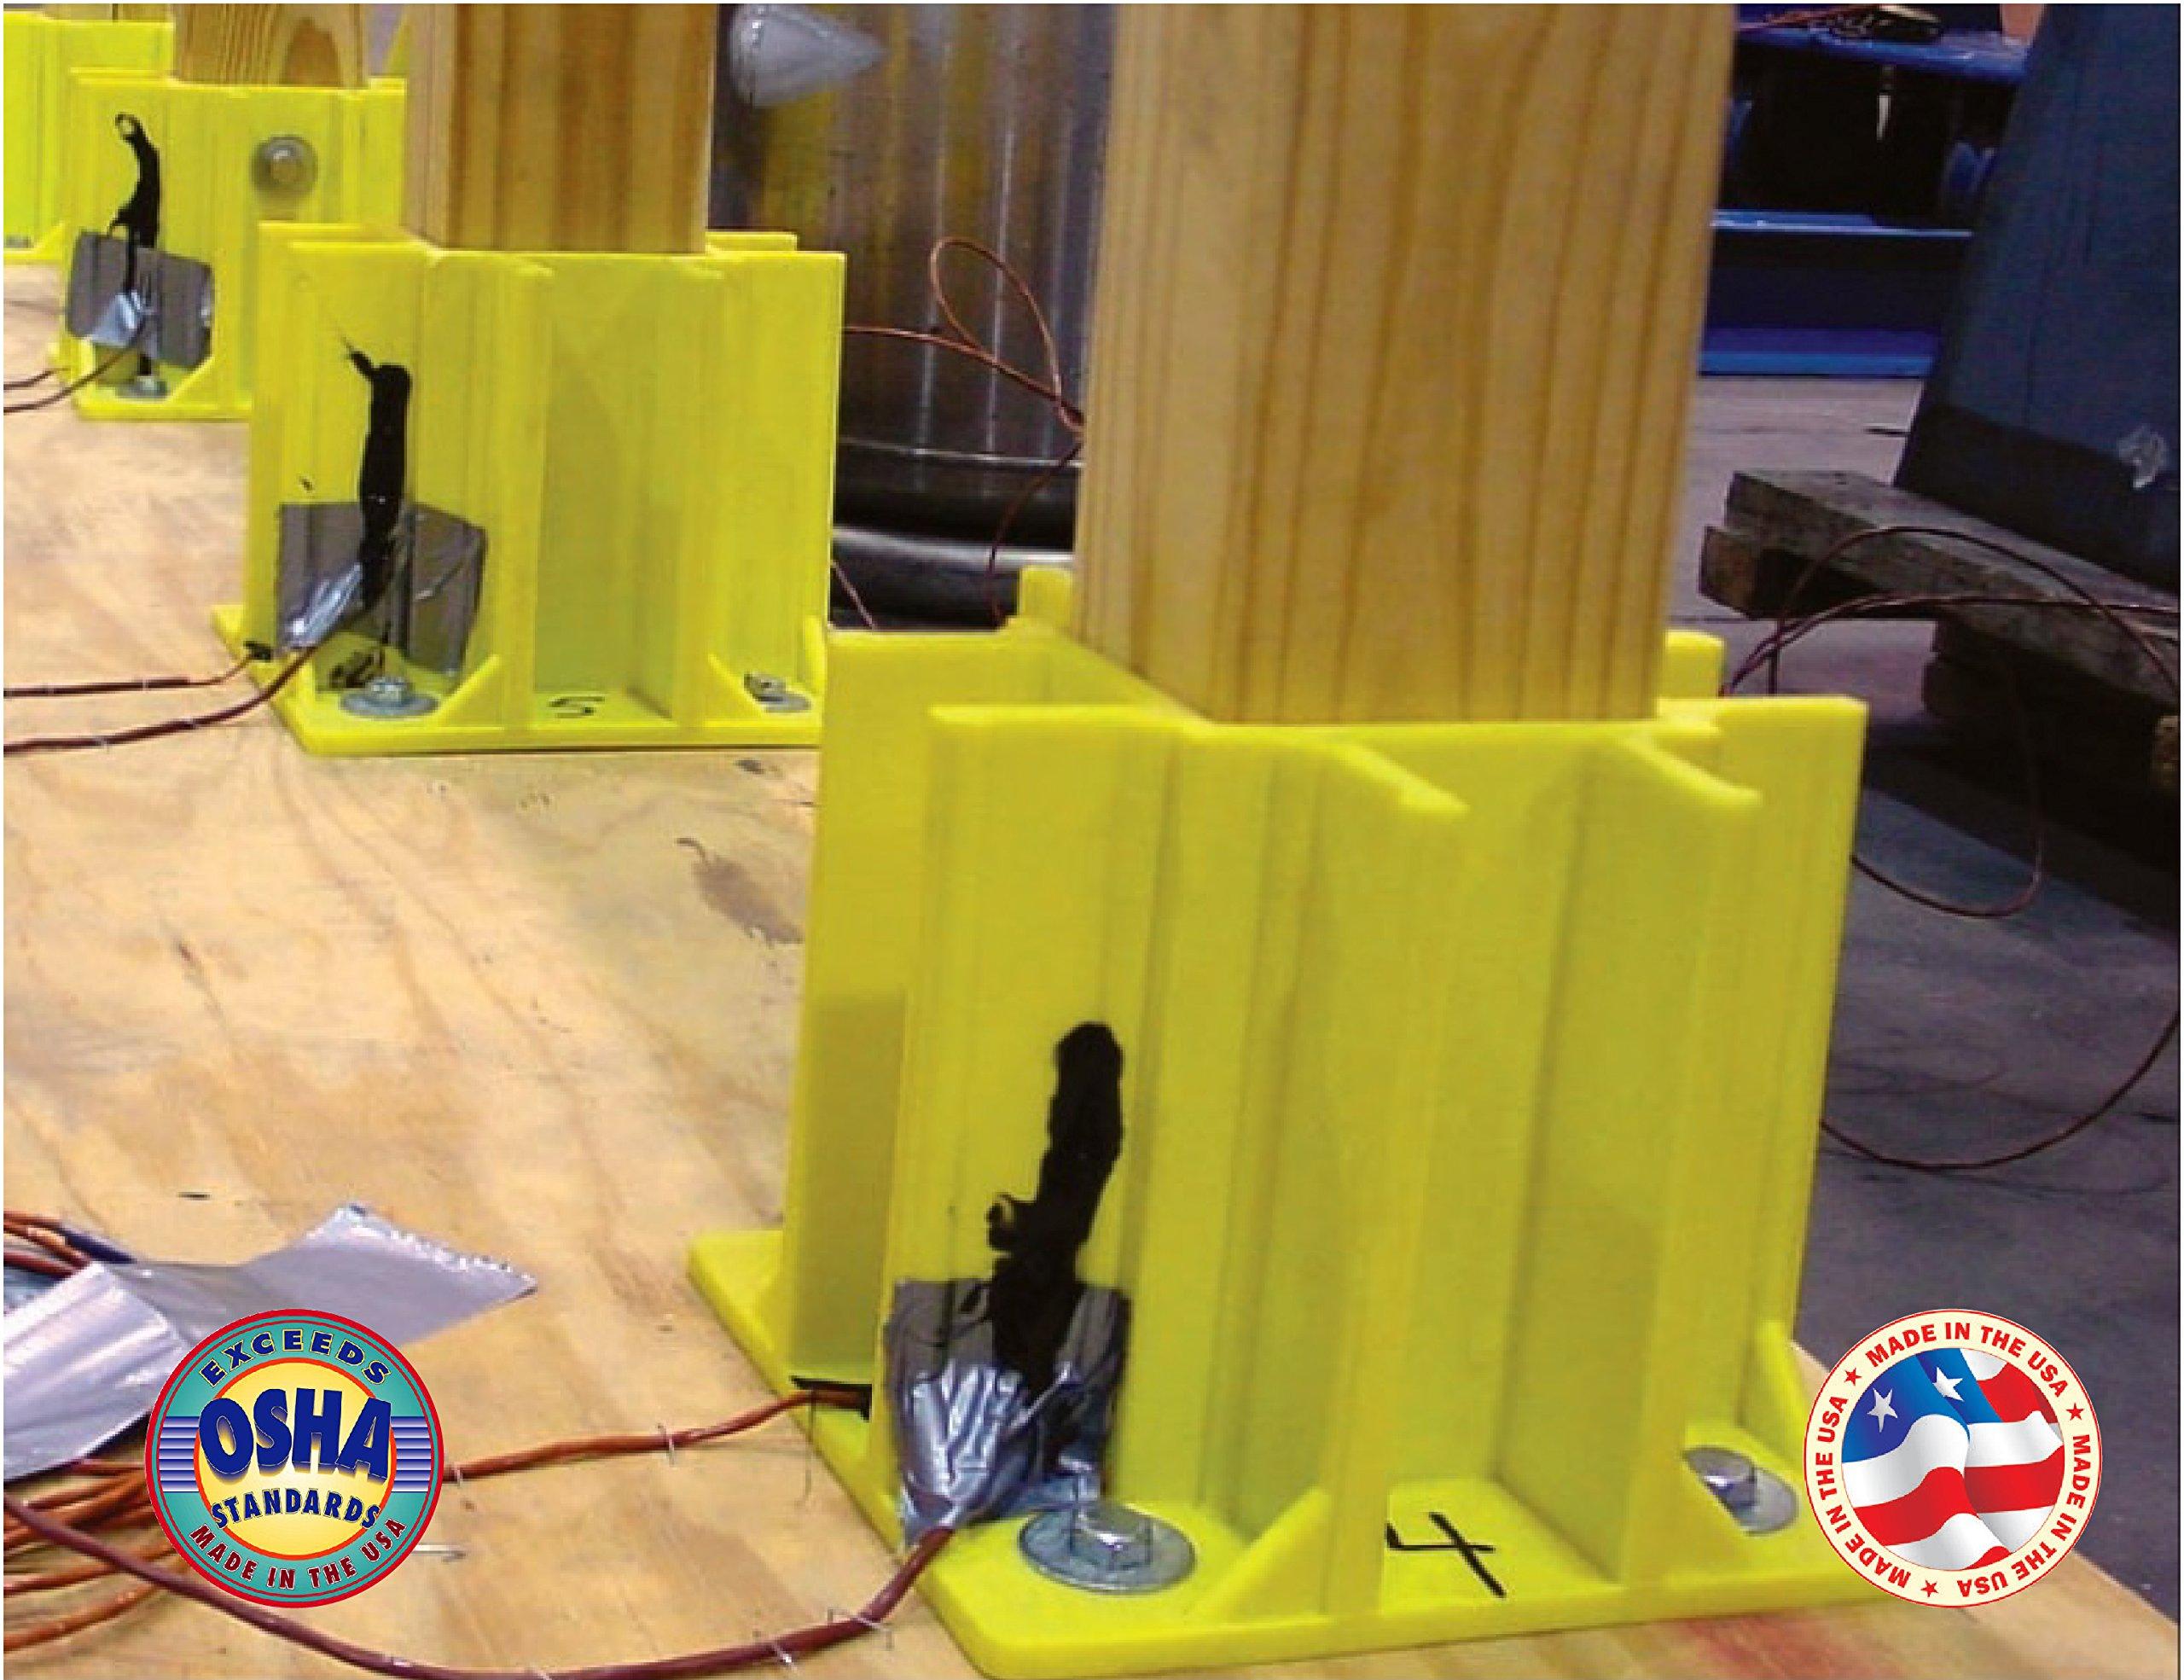 Safety Boot Yellow OSHA Temporary Guard Rail System by Safety Maker (12 Units) by Safety Maker, Inc. (Image #7)